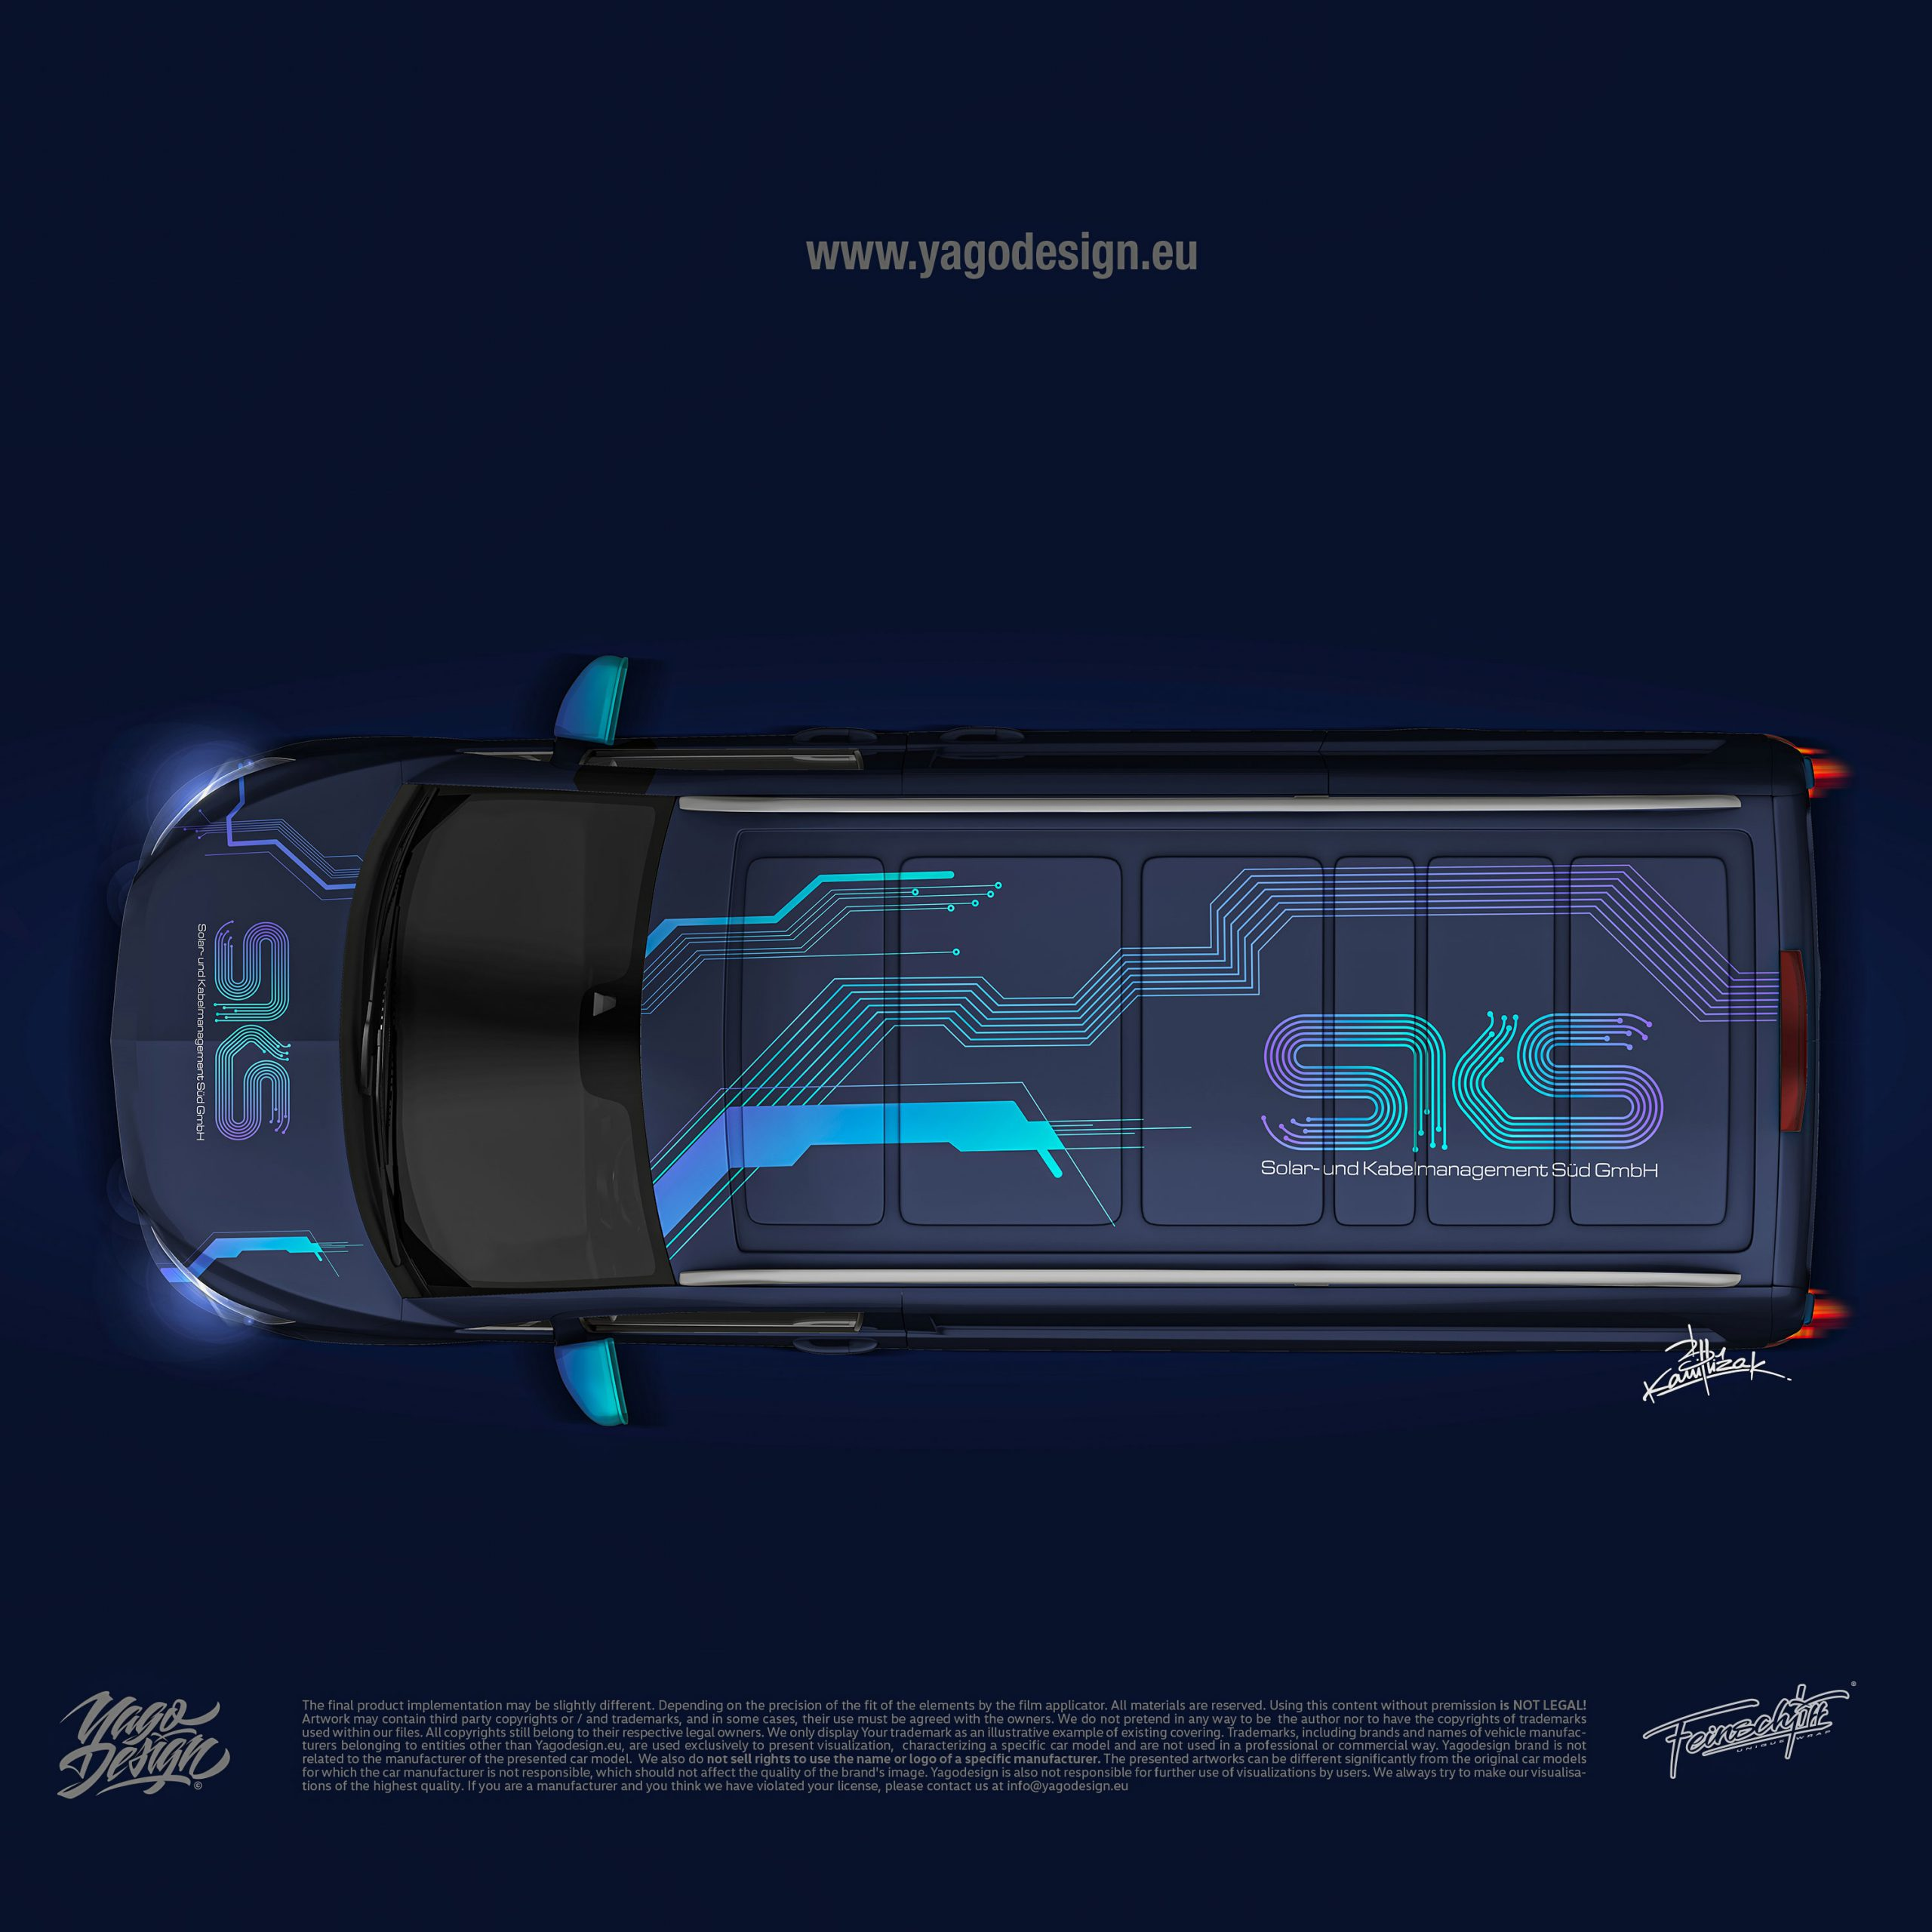 Mercedes-Benz-Vito-Panel-Van-by-Yagodesign-Automotive-Design-Studio-Top-View-scaled